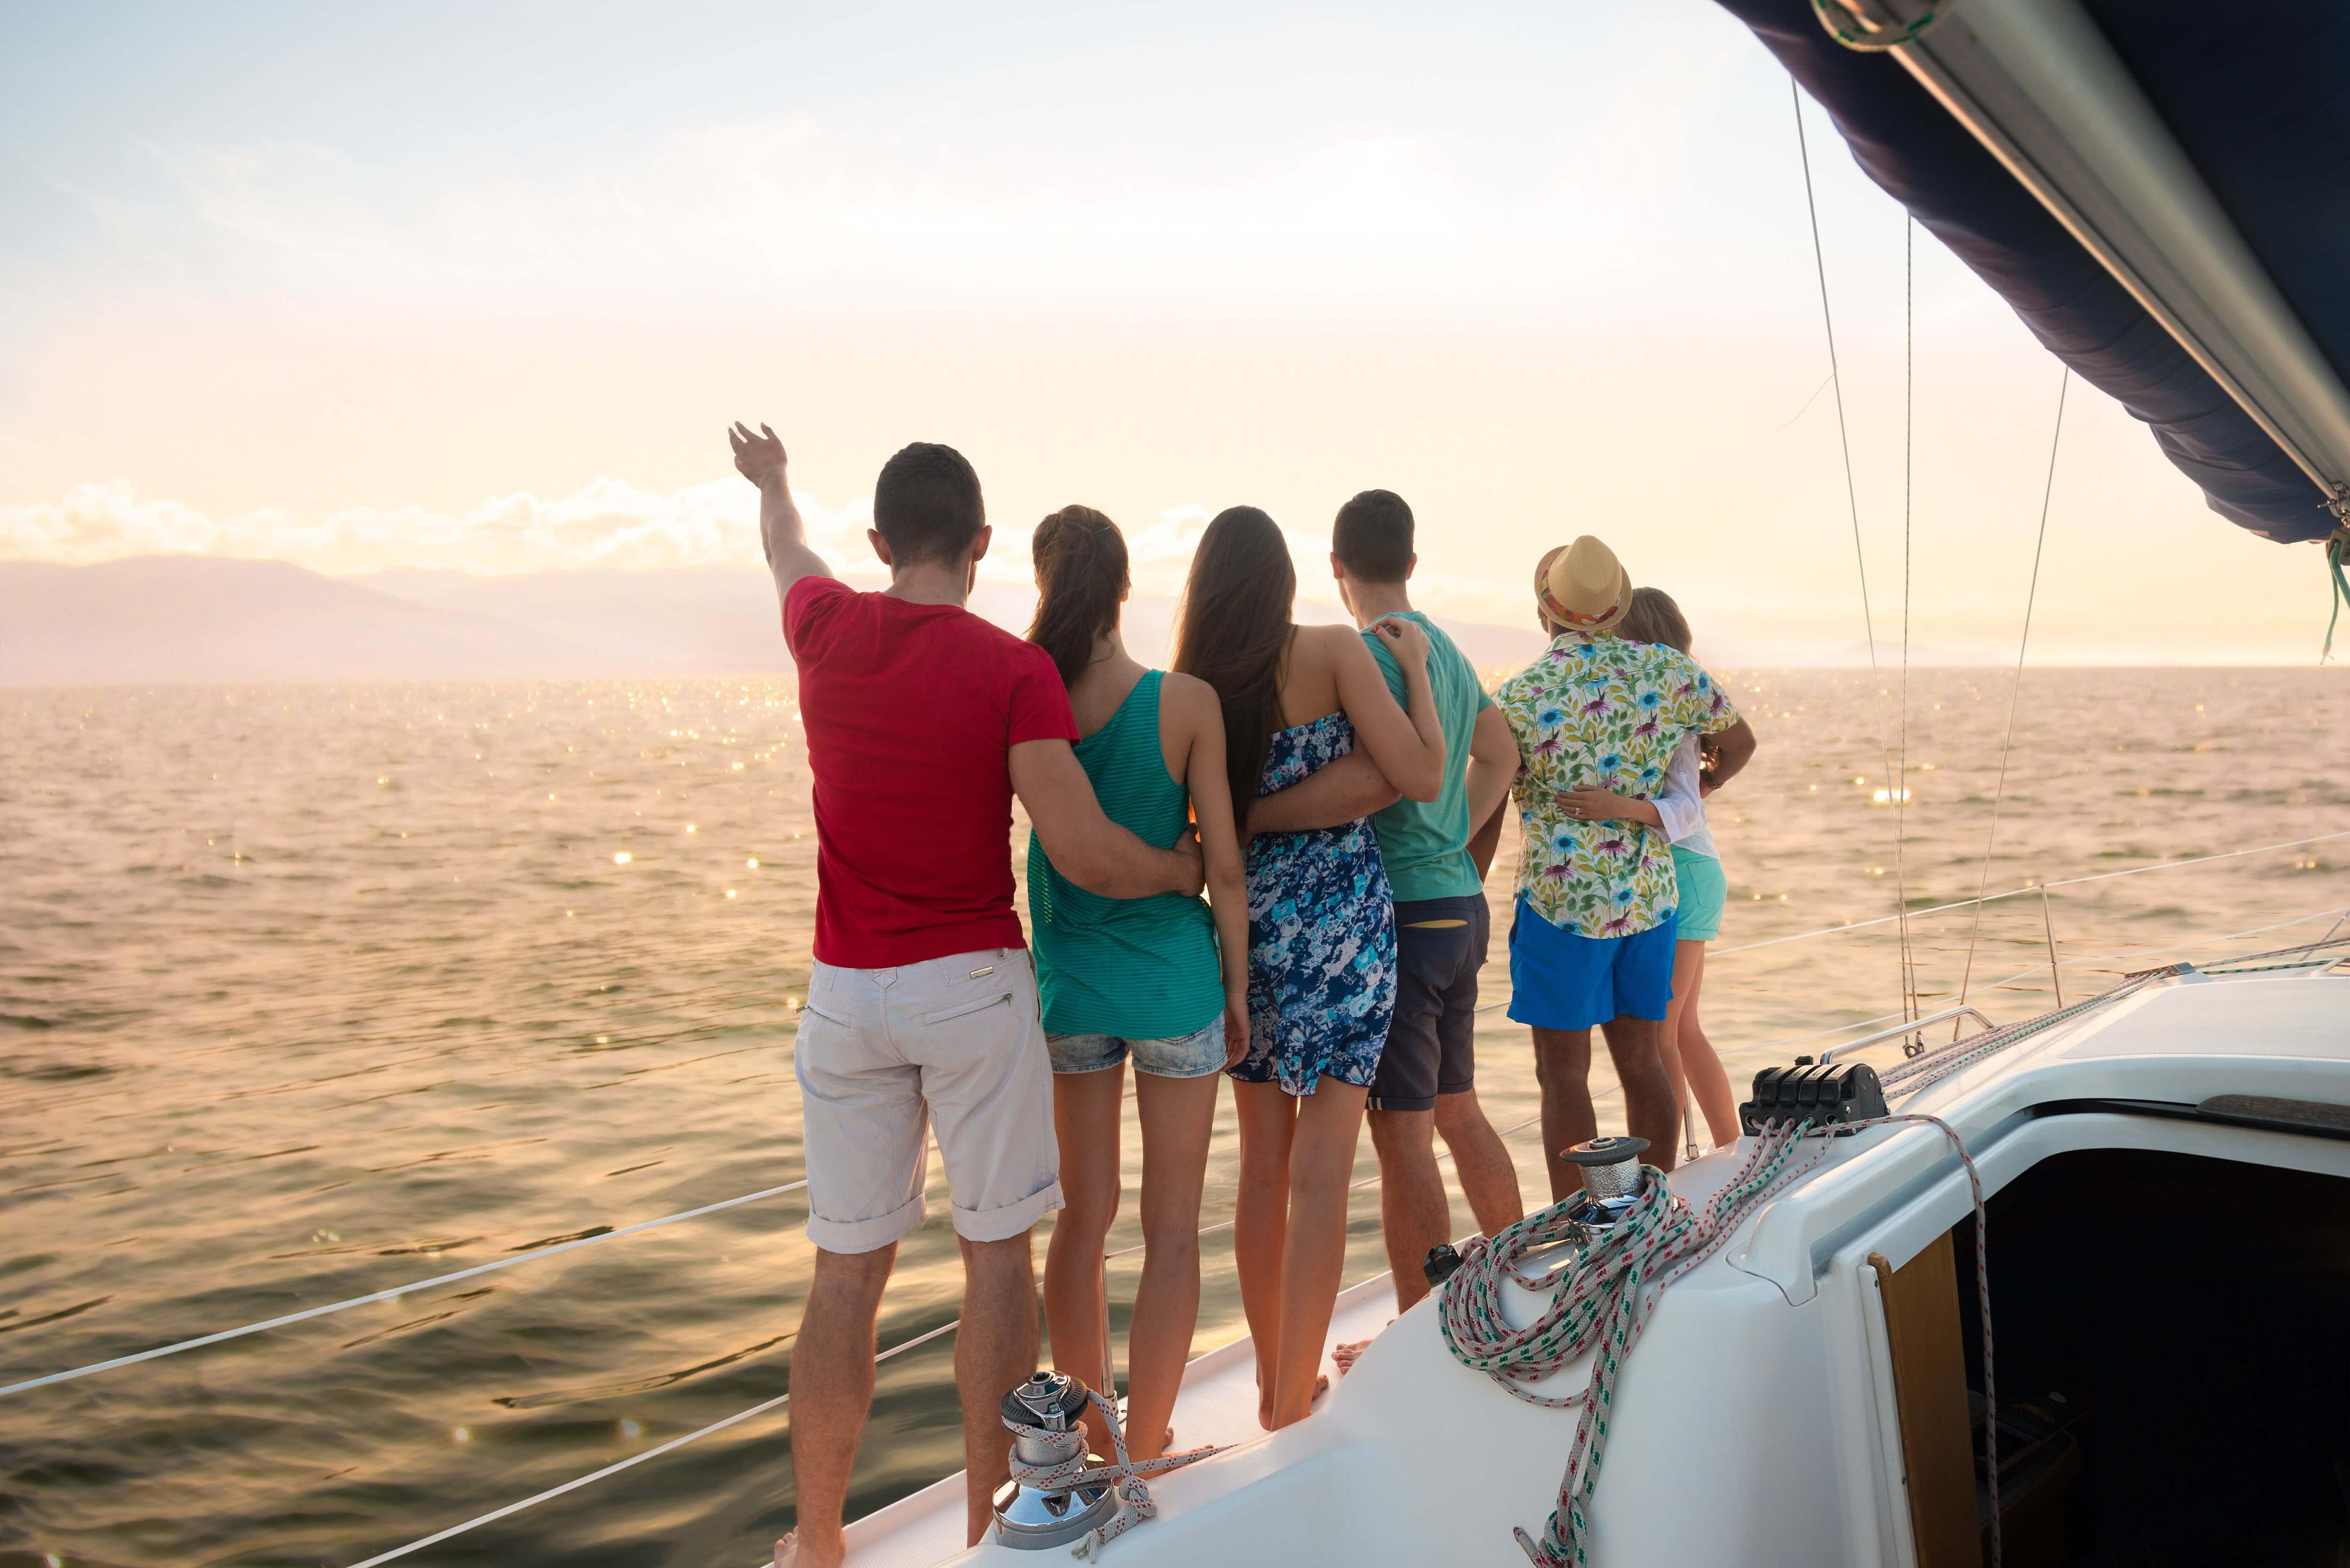 stromboli-yacht-charter-stromboli-yacht-rental-stromboli-boat-charter-stromboli-boat-rental-stromboli-sailing-charter-rental-boat